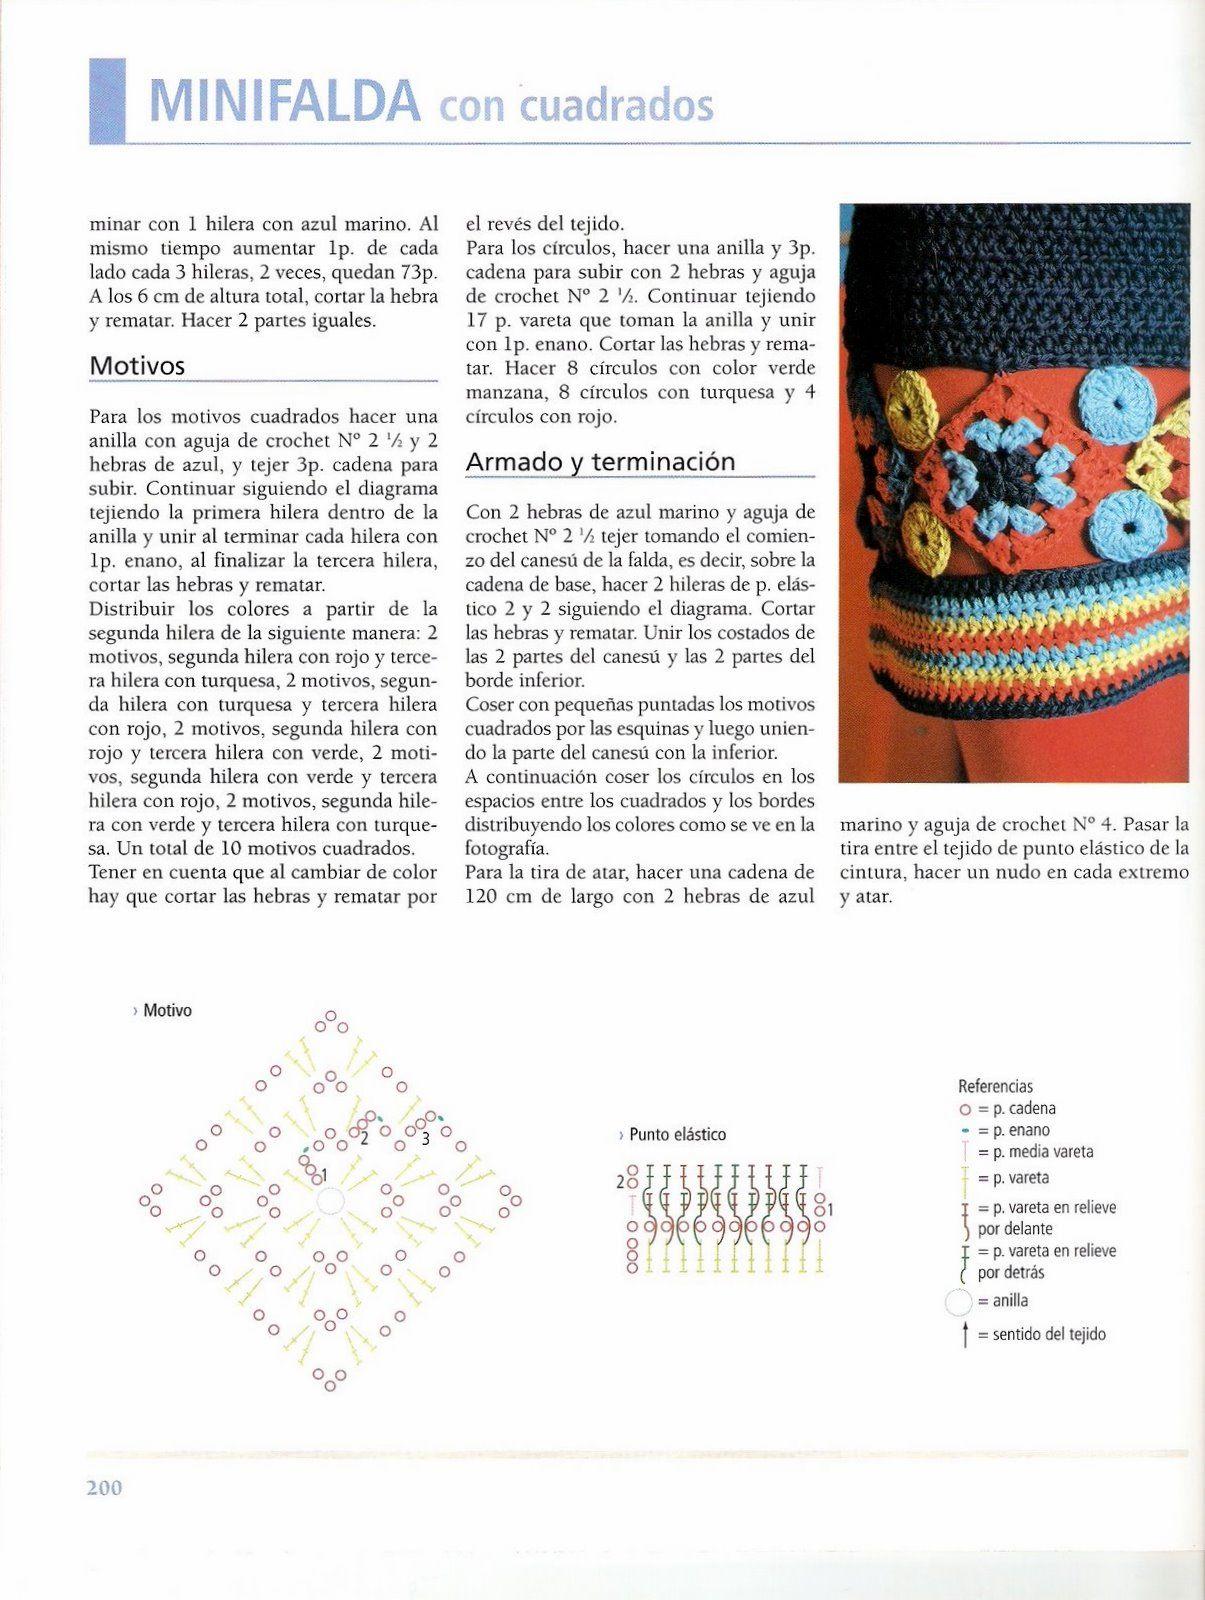 Publicado Por Artinails En 12 27